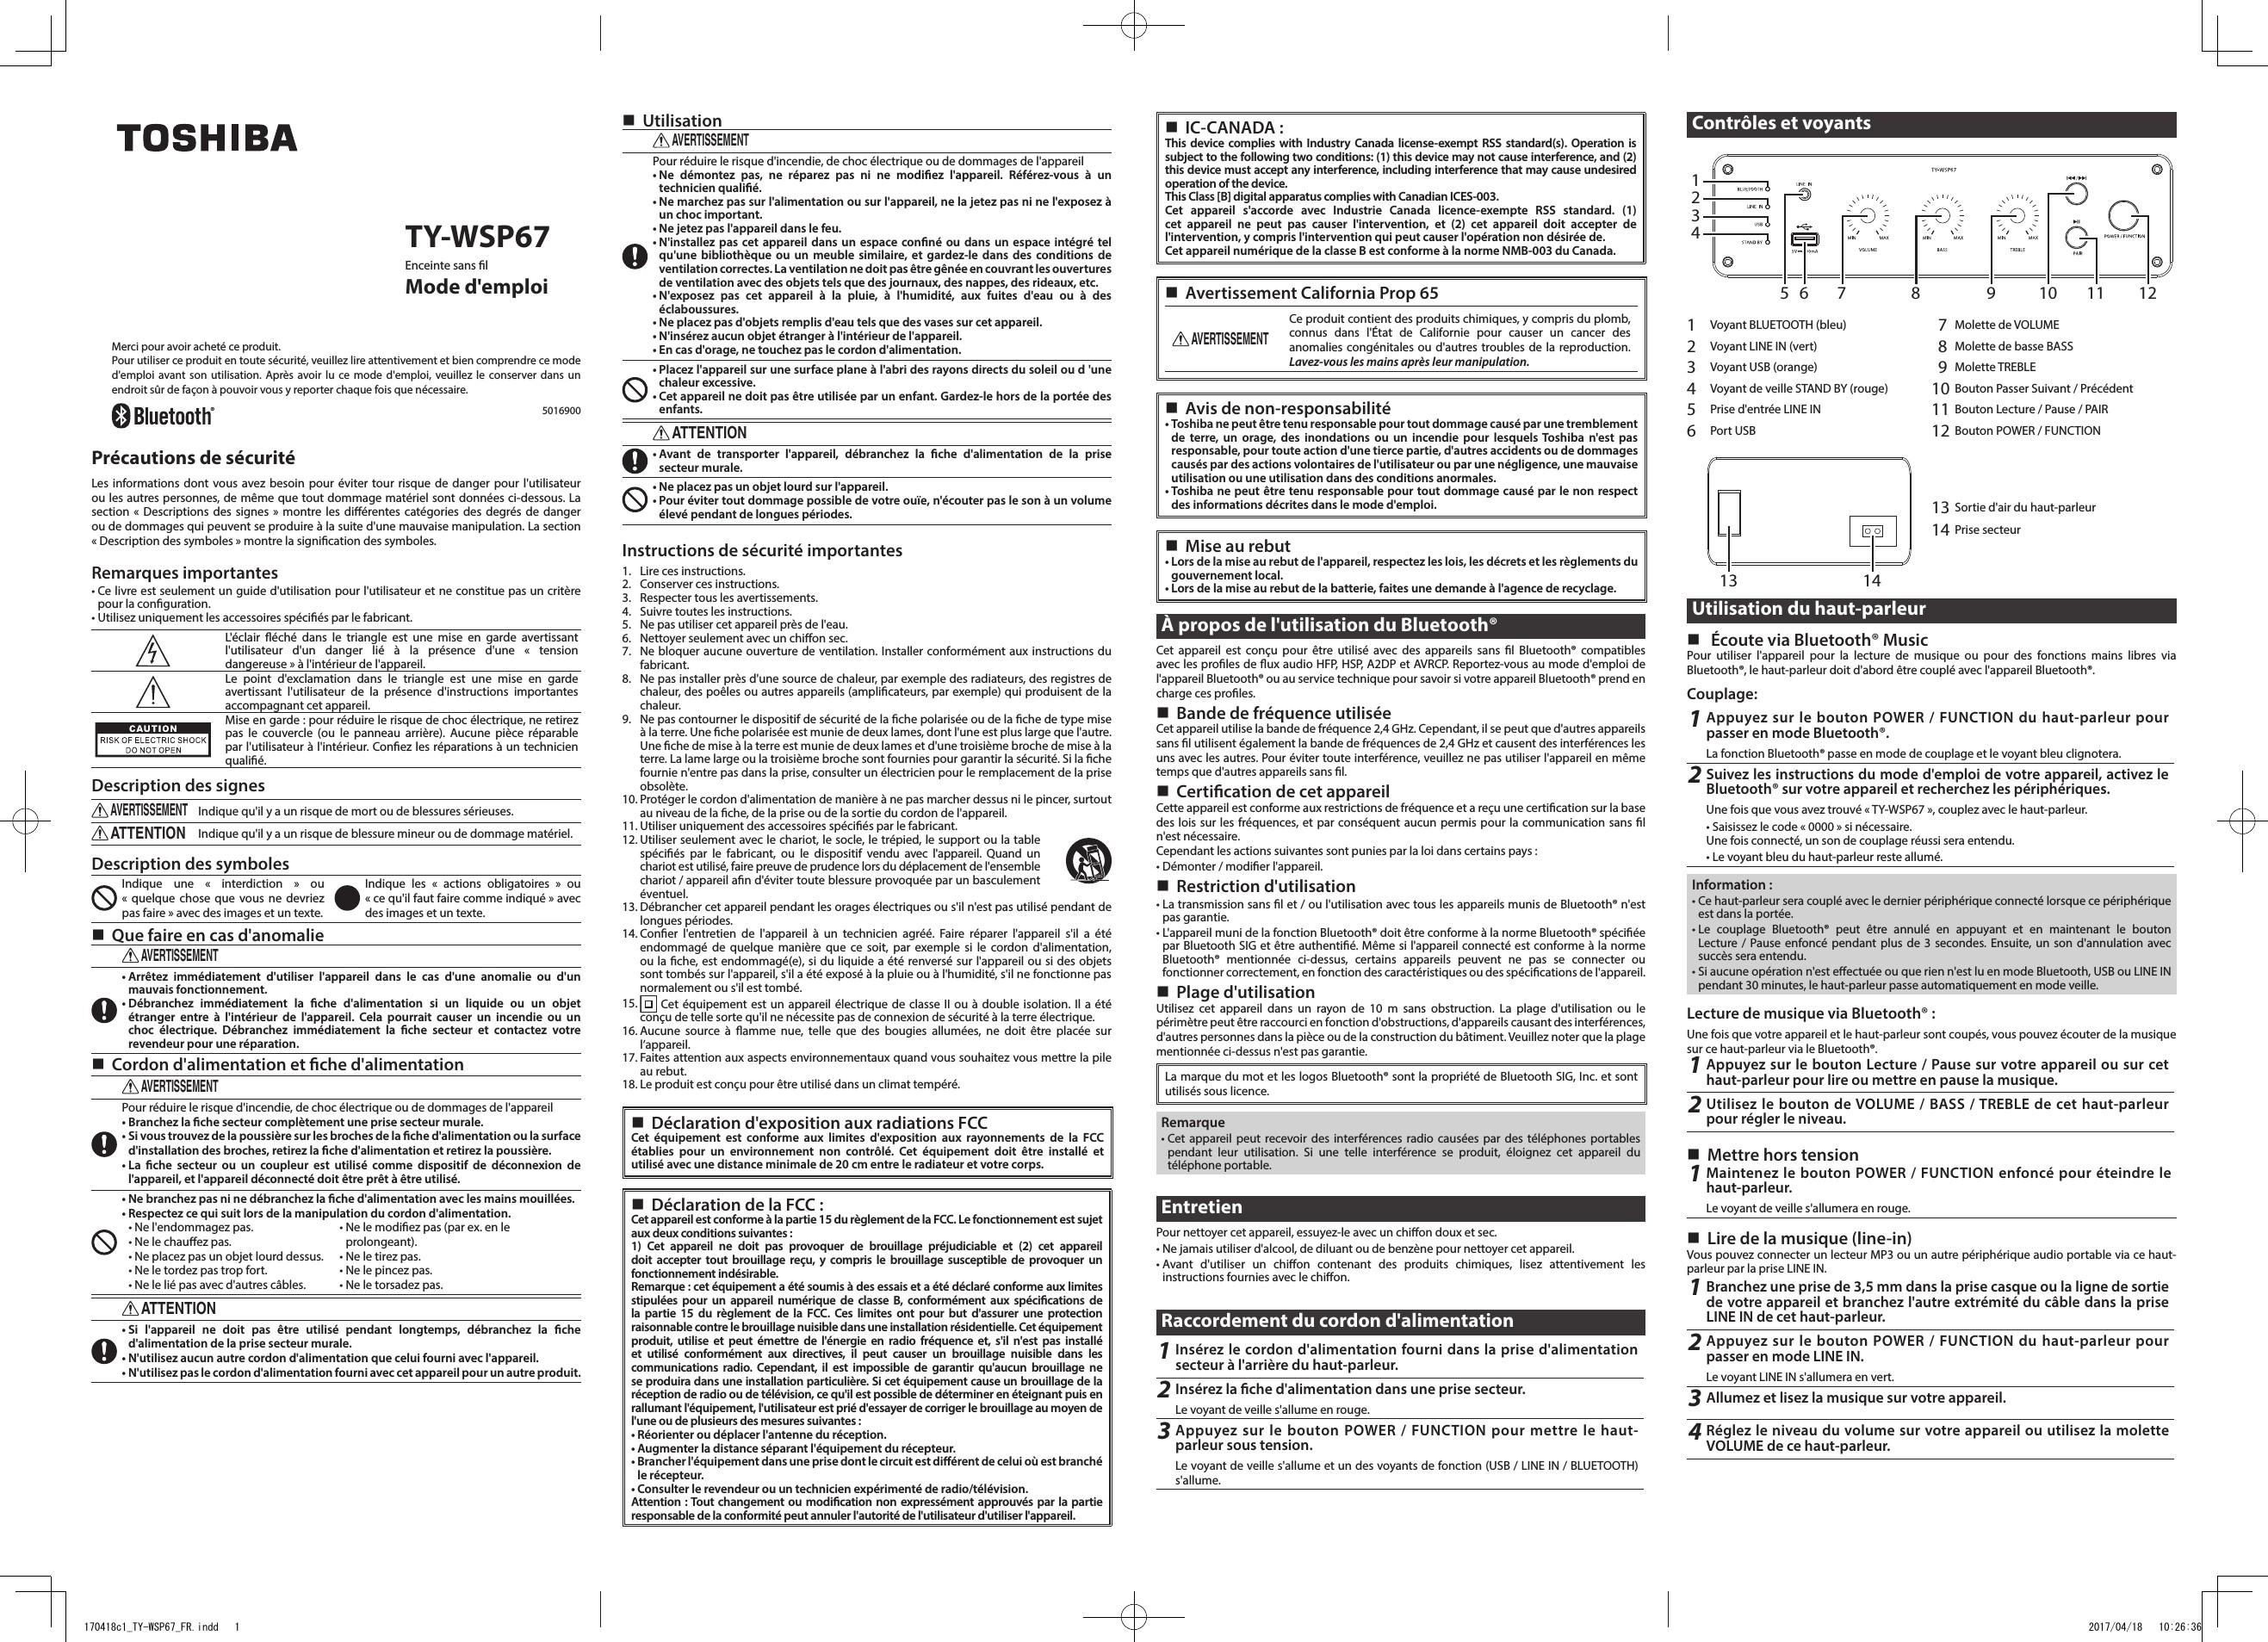 Kib Model M21vw Manual Pdf Wsp67 Wireless Speaker User Manual C1 Ty Wsp67 Endd Of Kib Model M21vw Manual Pdf